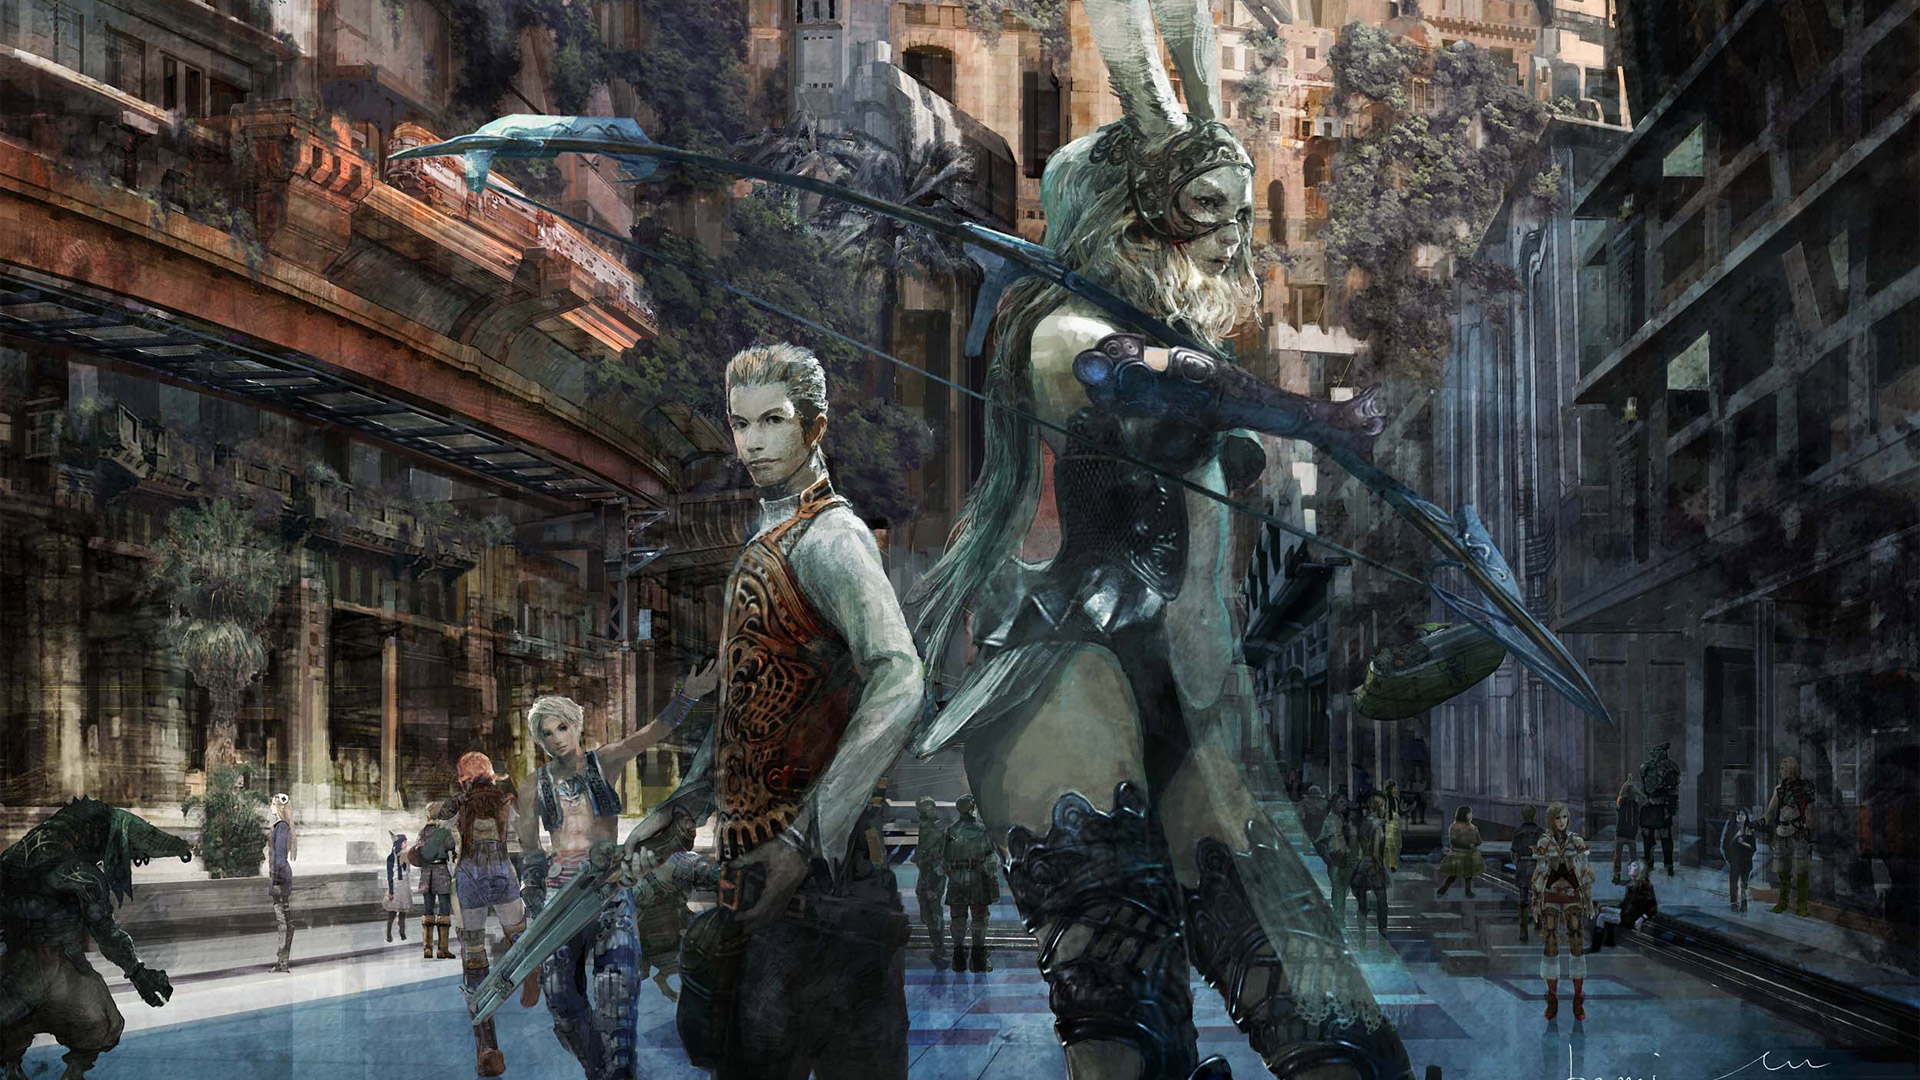 Free Final Fantasy XII Wallpaper in 1920x1080